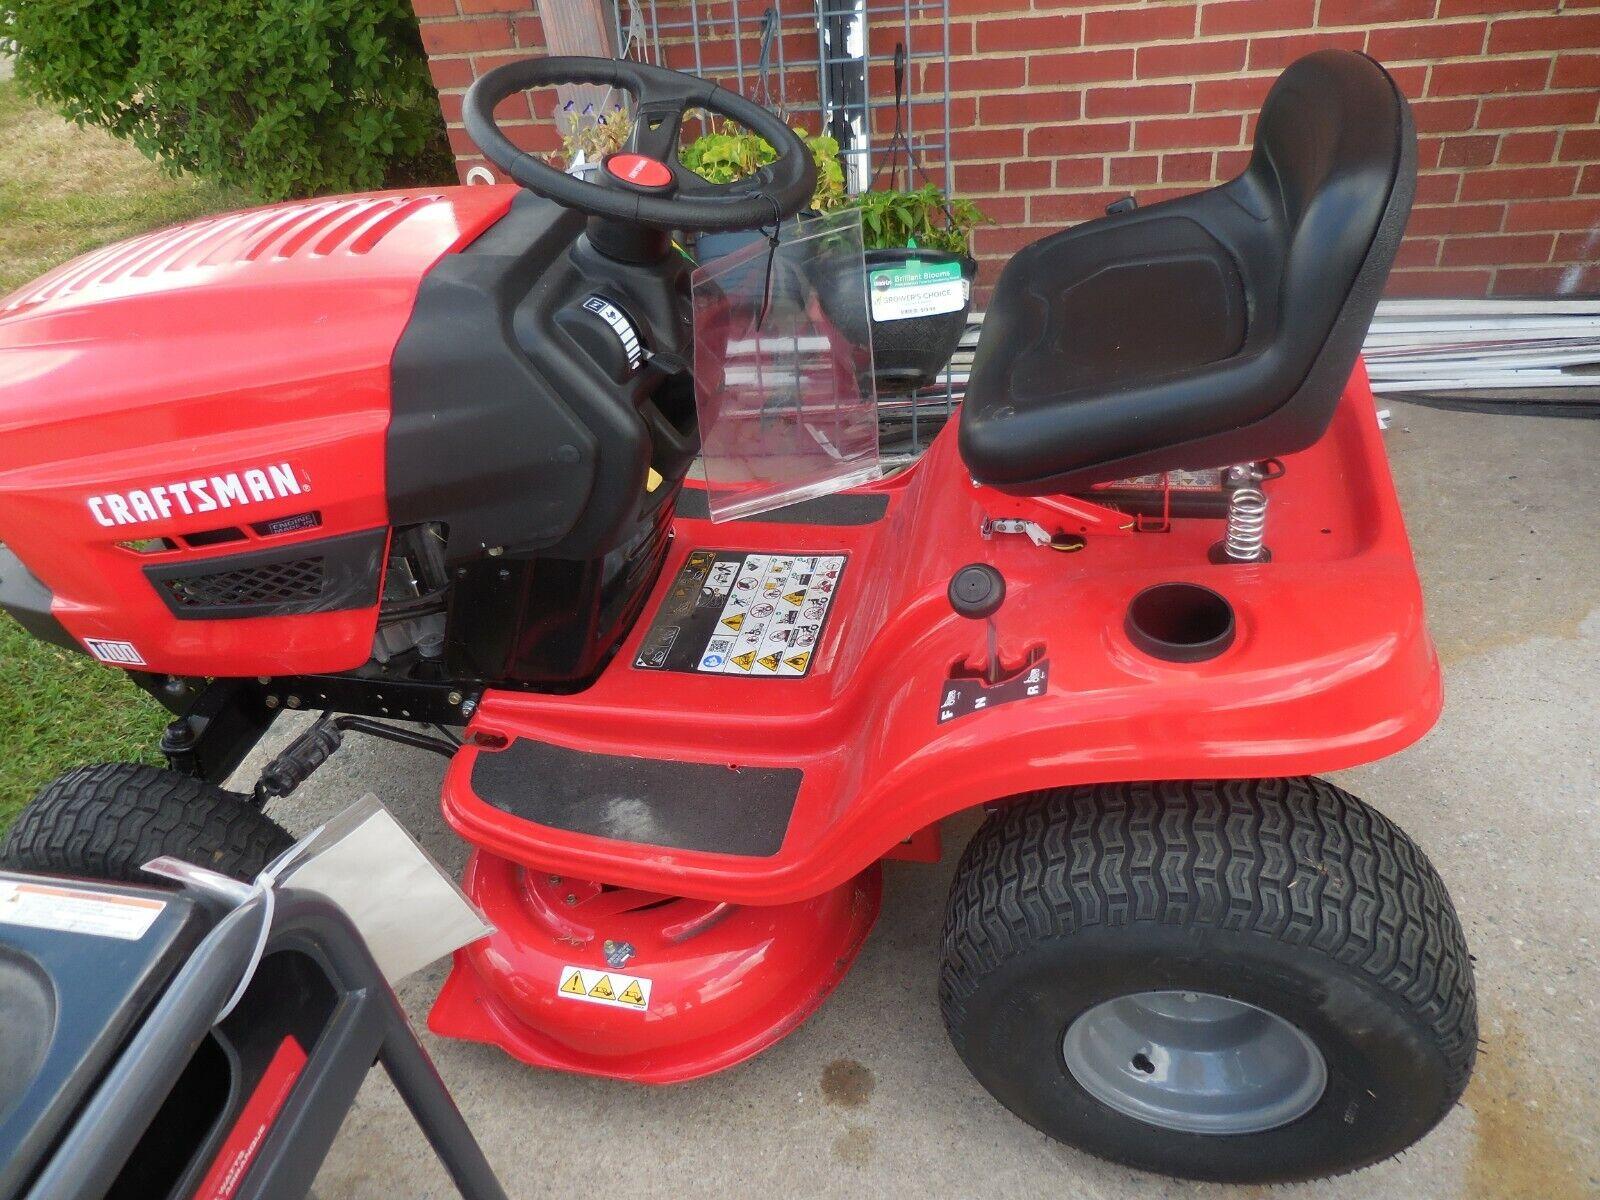 Craftsman T100 36-in Riding Lawn Mower CMXGRAM201302